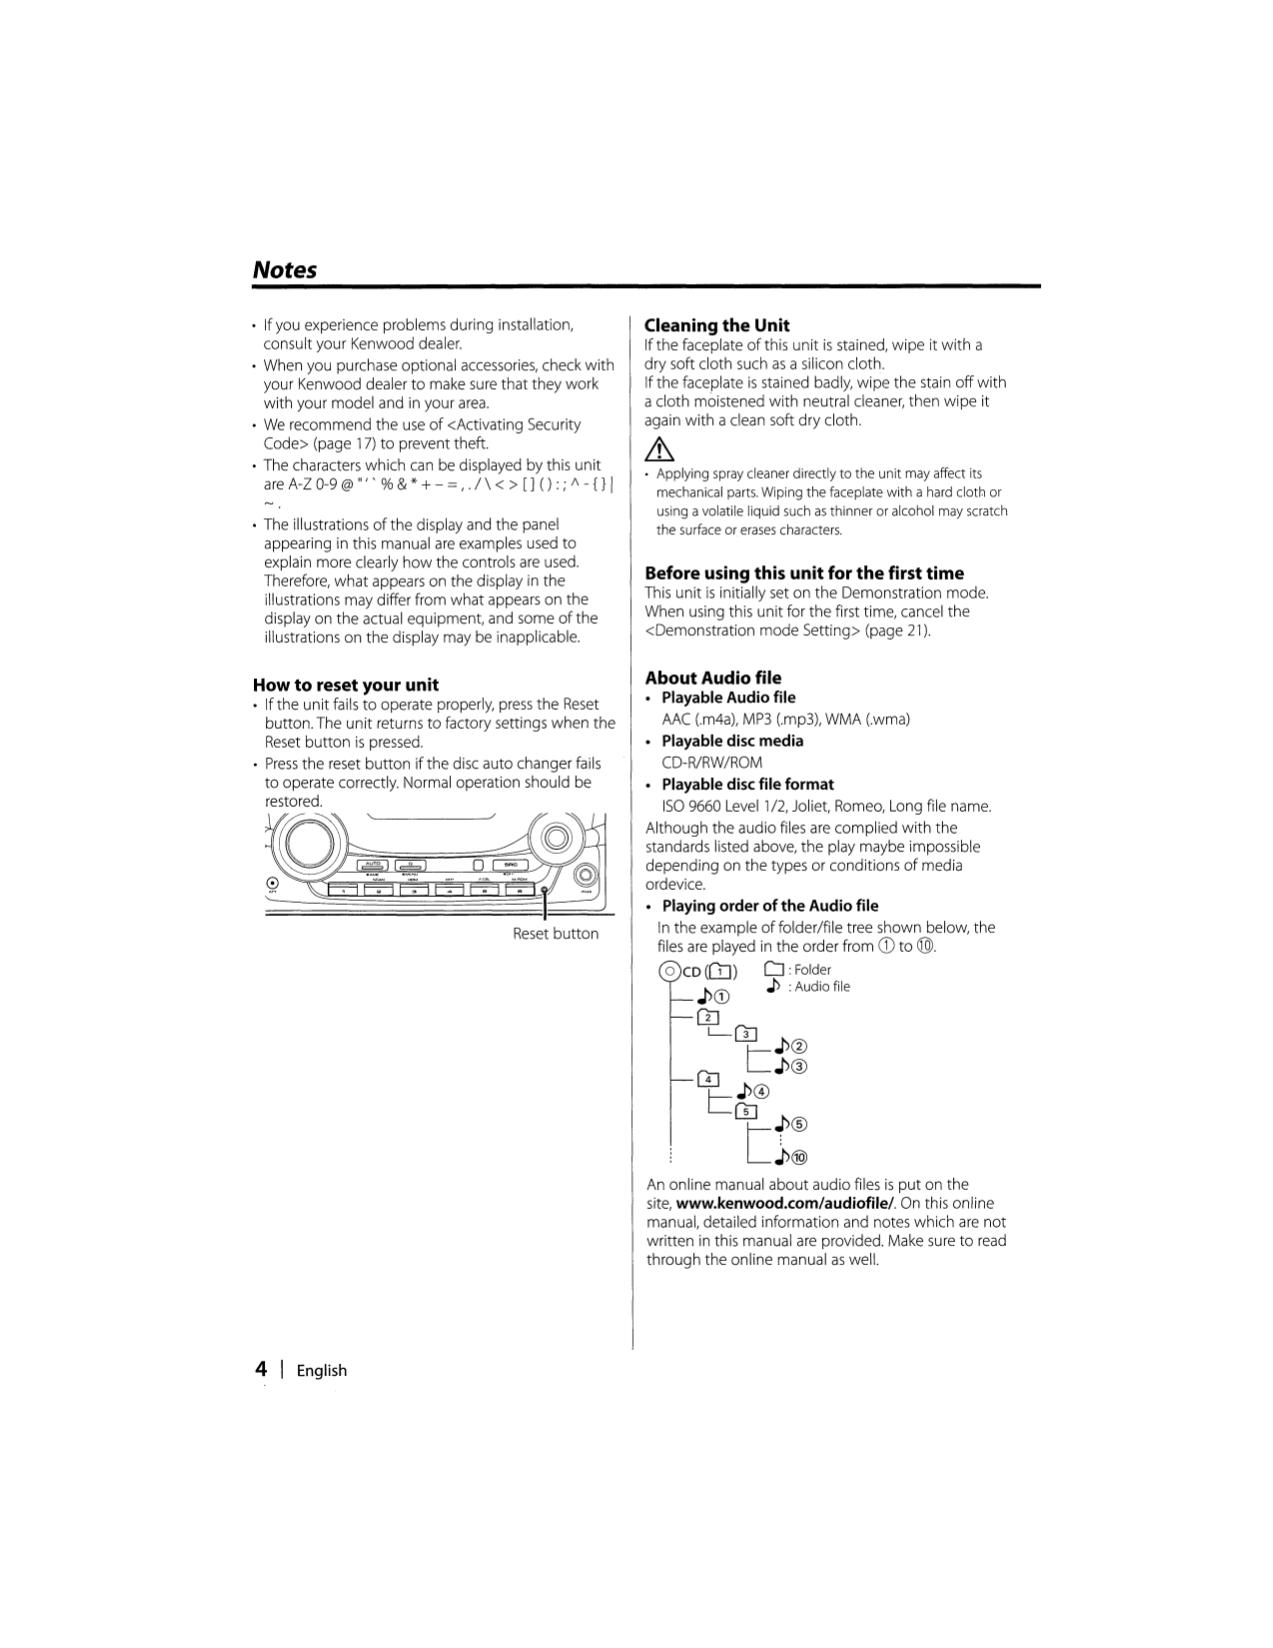 PDF manual for Kenwood Car Receiver DPX-302